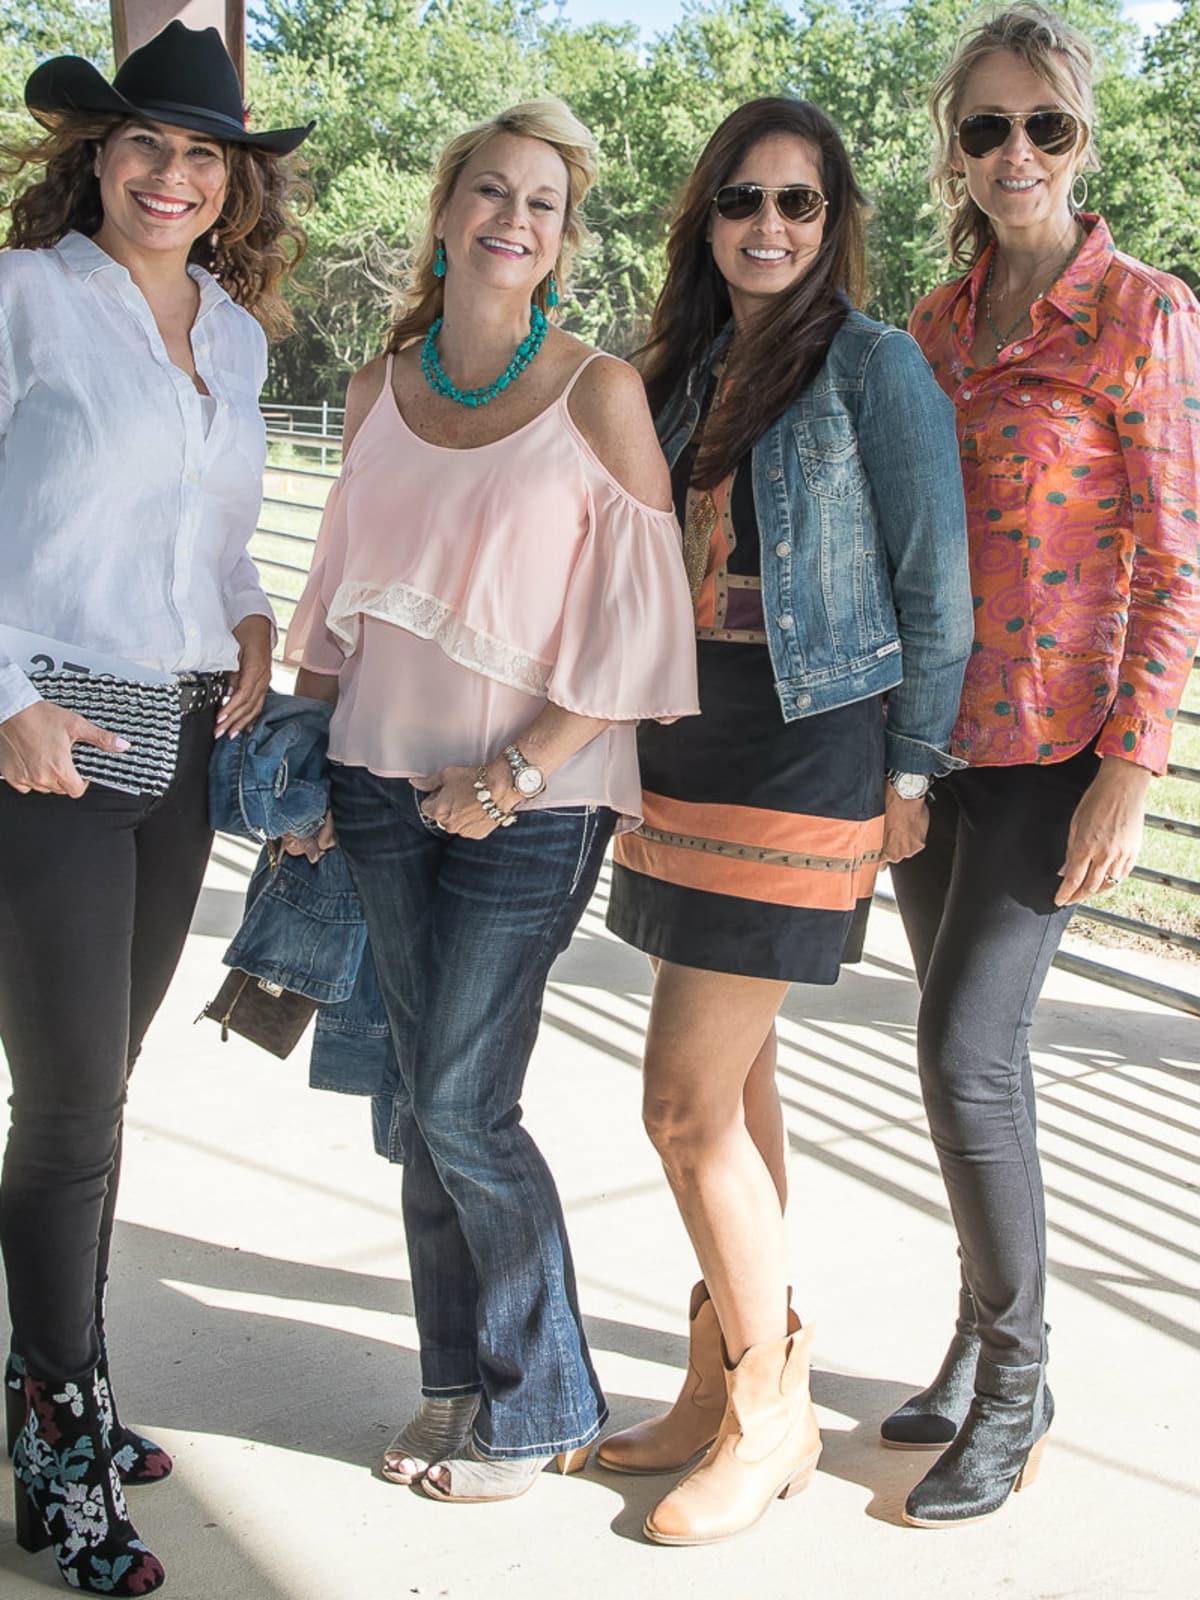 Norma Jean Schaltenbrand, Nancy Henger, Ana Rodriguez, Carolyn Anderson